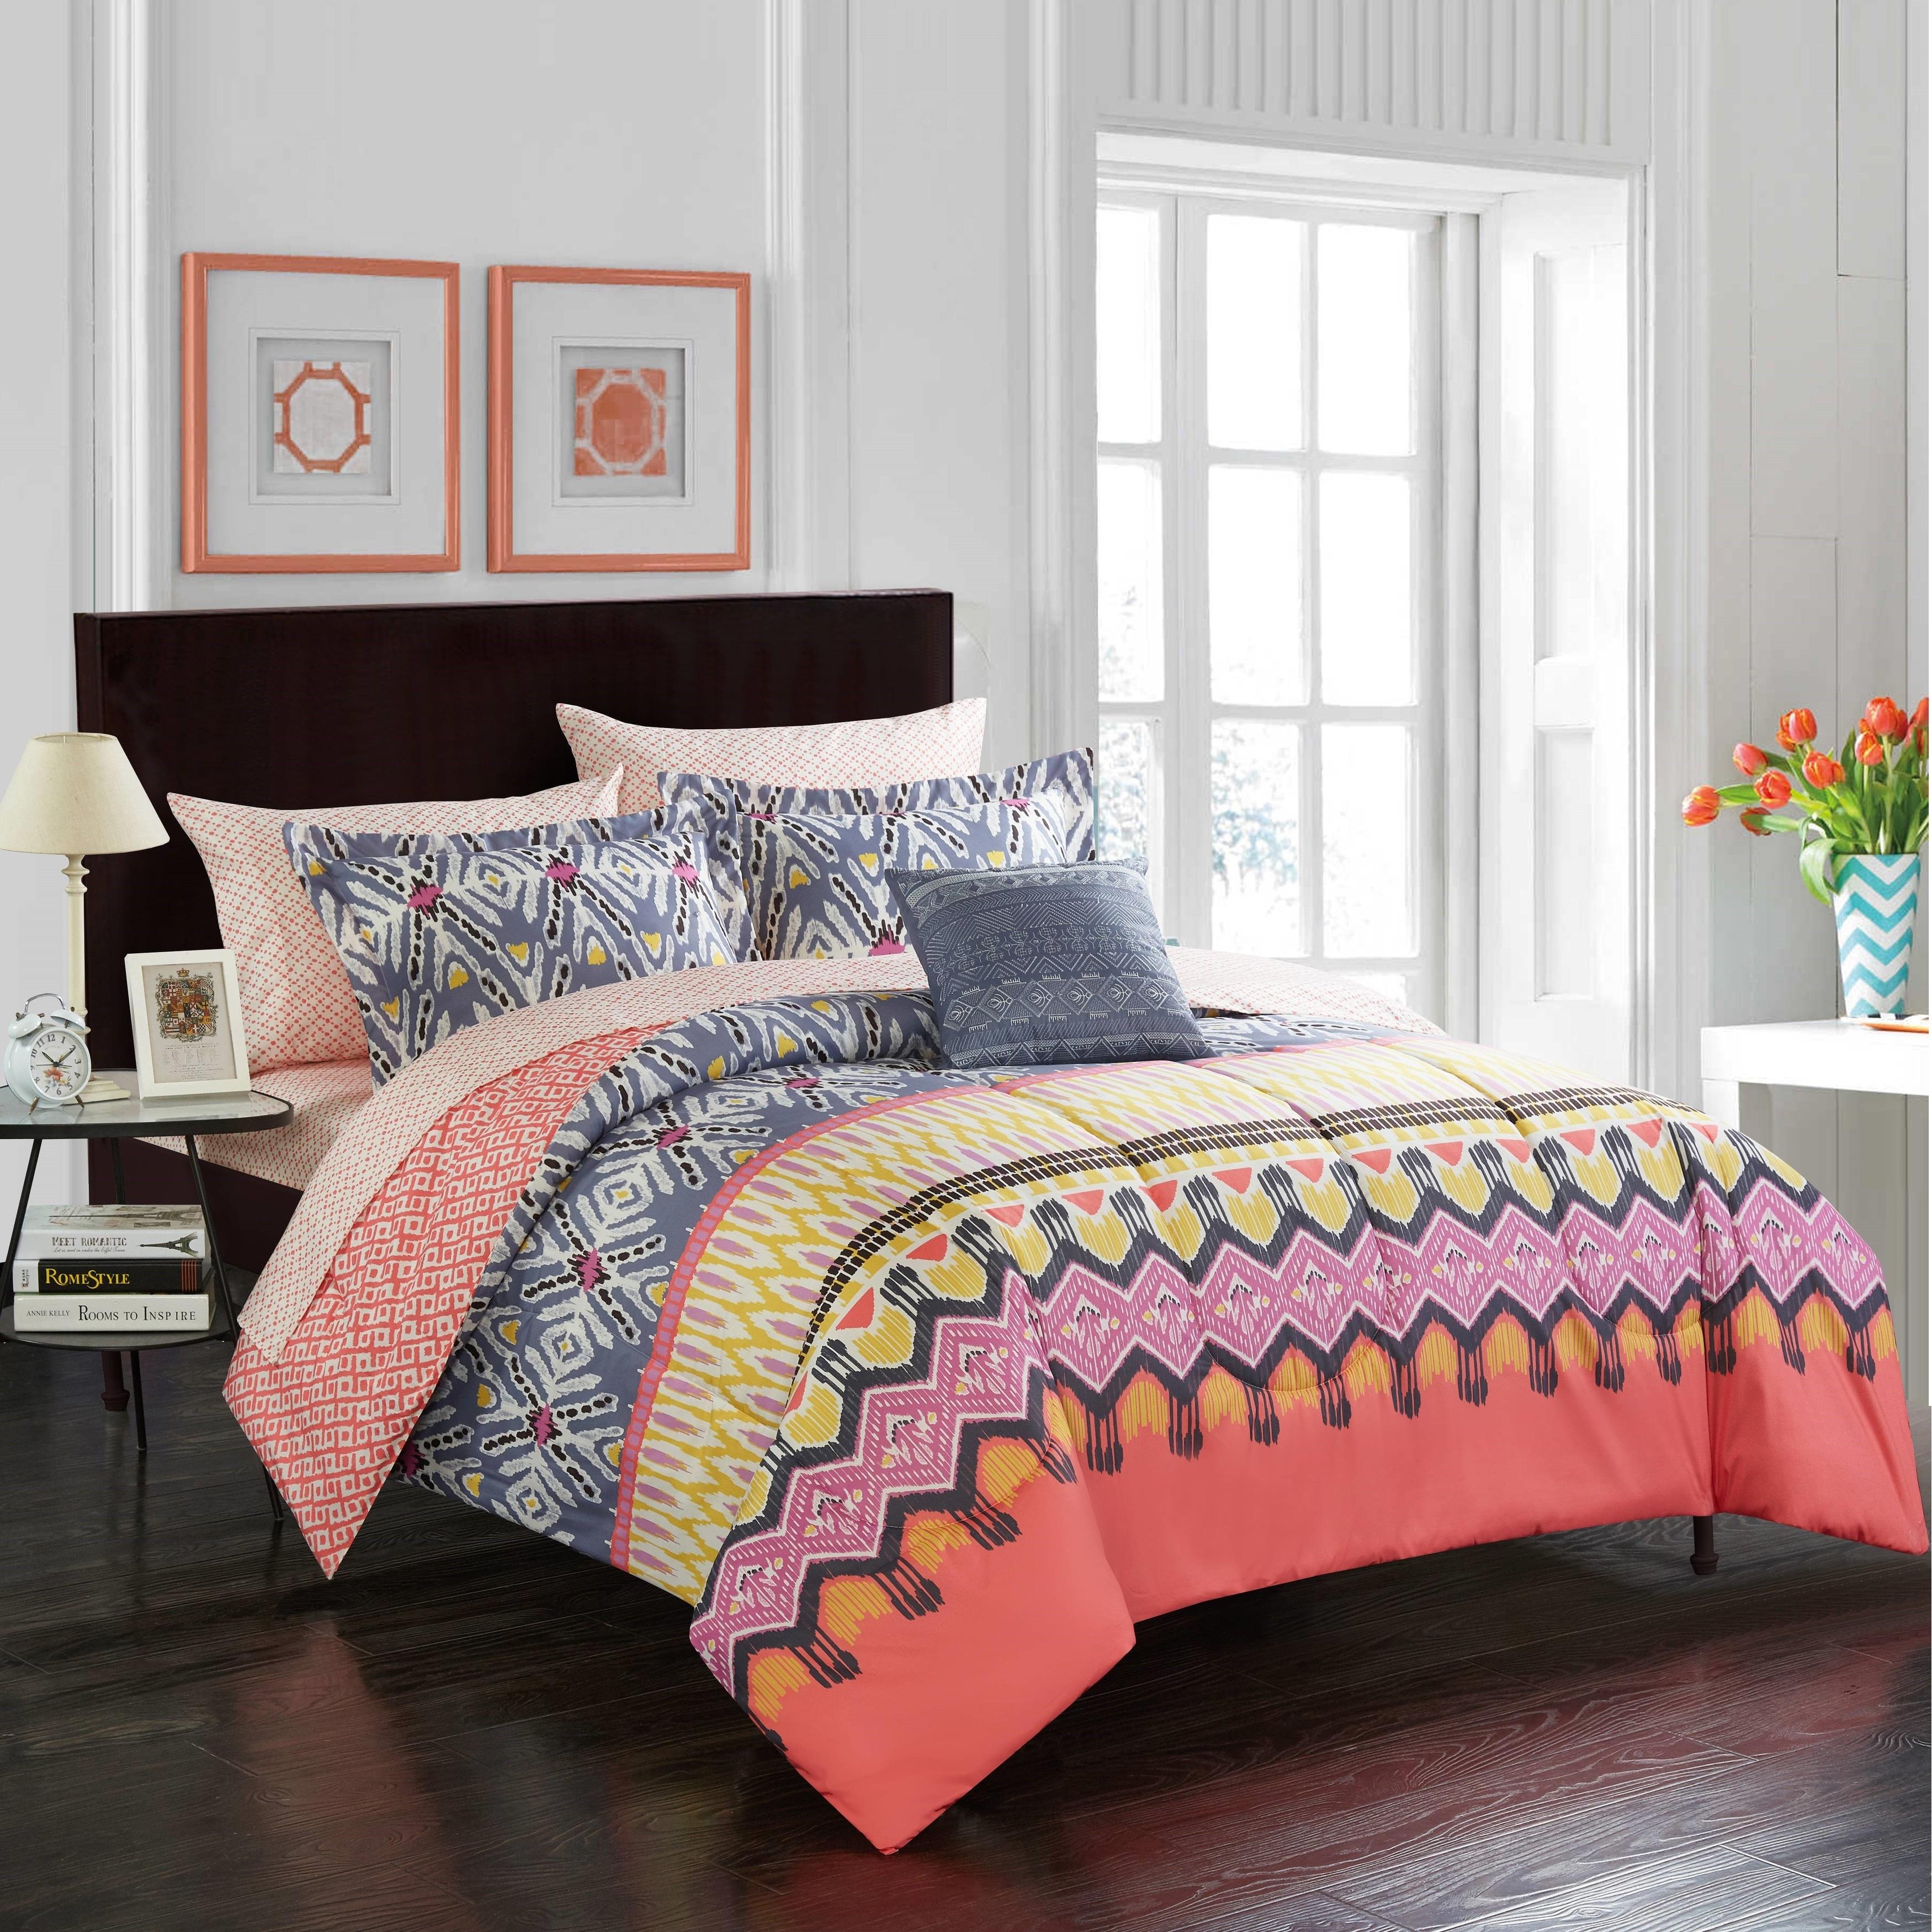 Boho Kamali Comforter Set Overstock 31634604